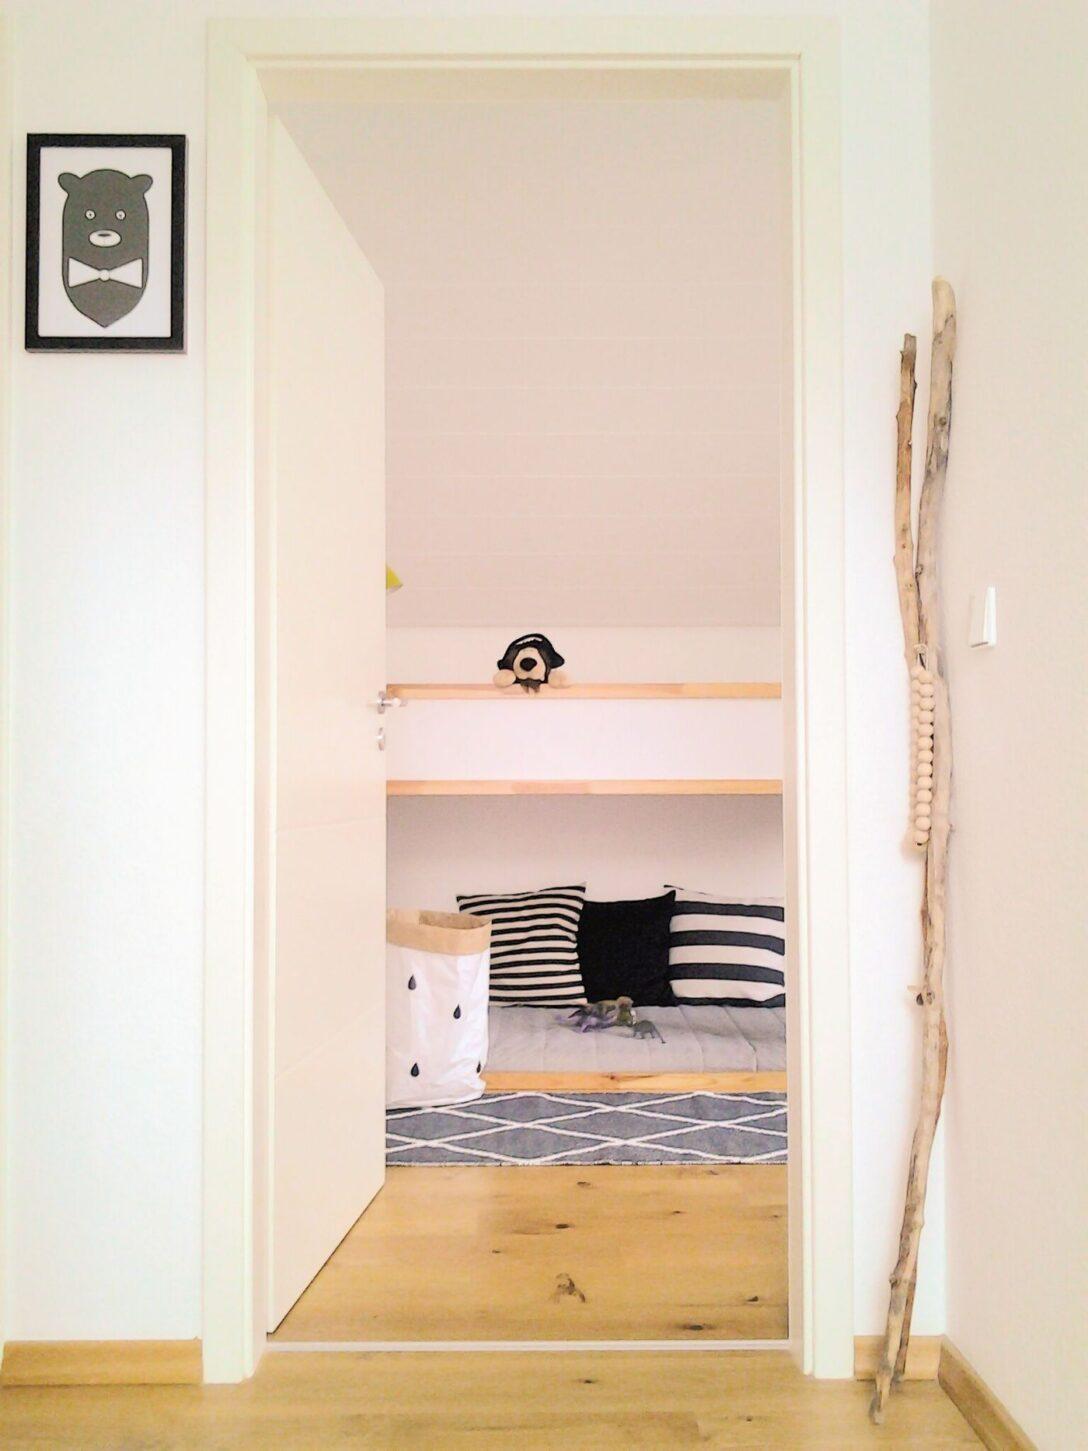 Large Size of Deckenleuchte Skandinavisches Design Holz Skandinavisch Flur Schlafzimmer Skandinavischer Stil Deckenleuchten Wohnzimmer Kinderzimmer Skandinavische Led Bad Wohnzimmer Deckenleuchte Skandinavisch